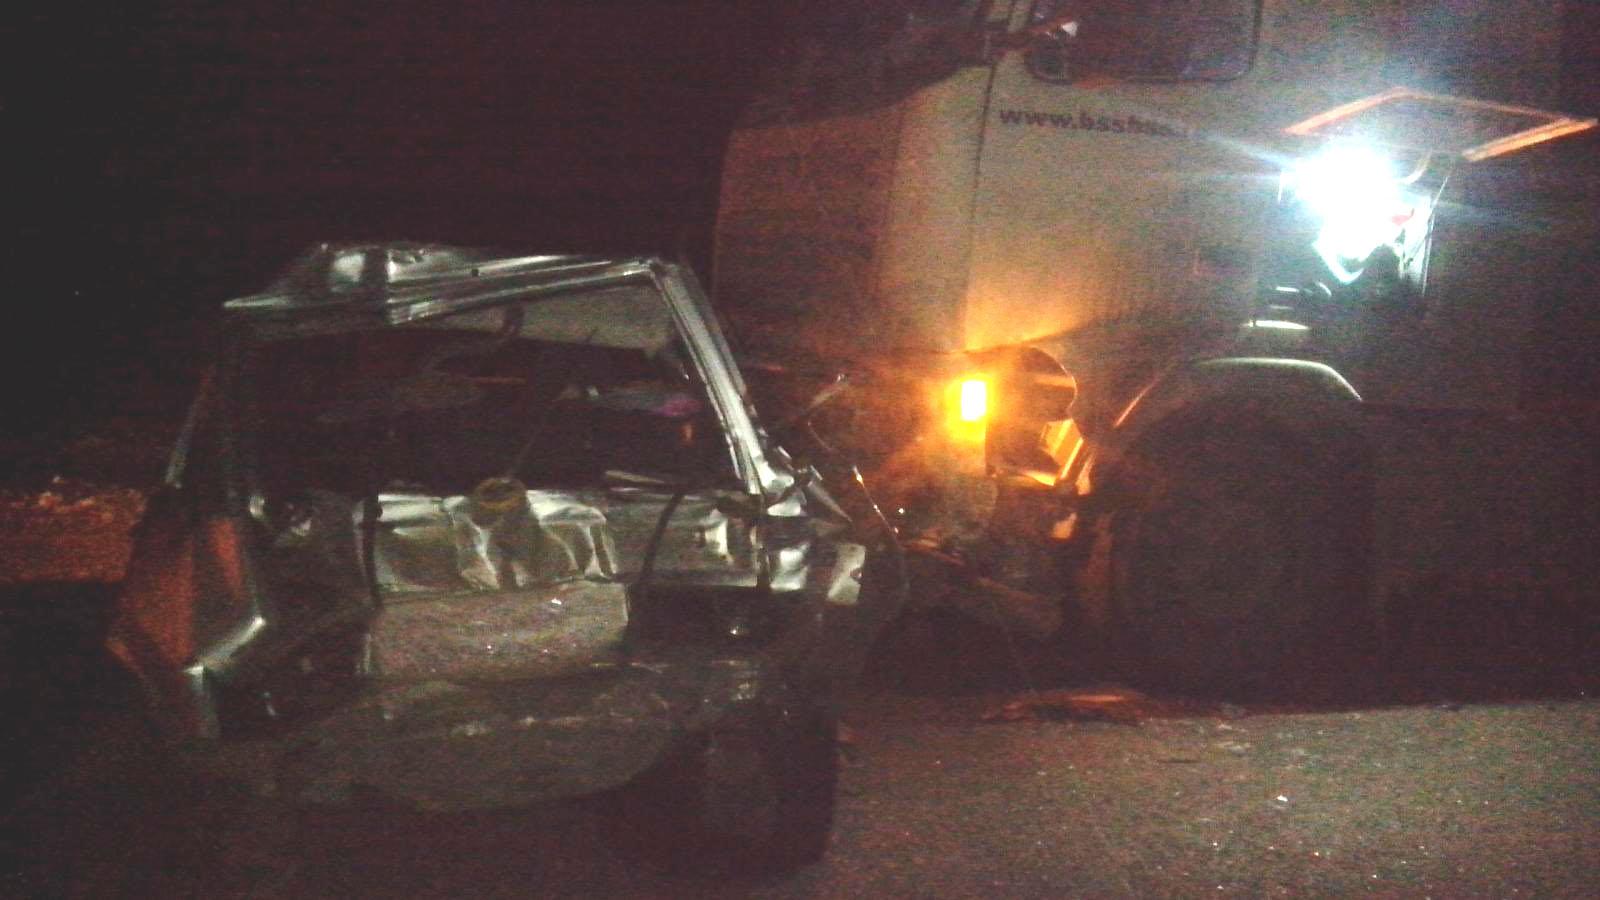 Под Тамбовом «Лада» врезалась в фургон, шофёр «легковушки» в клинике